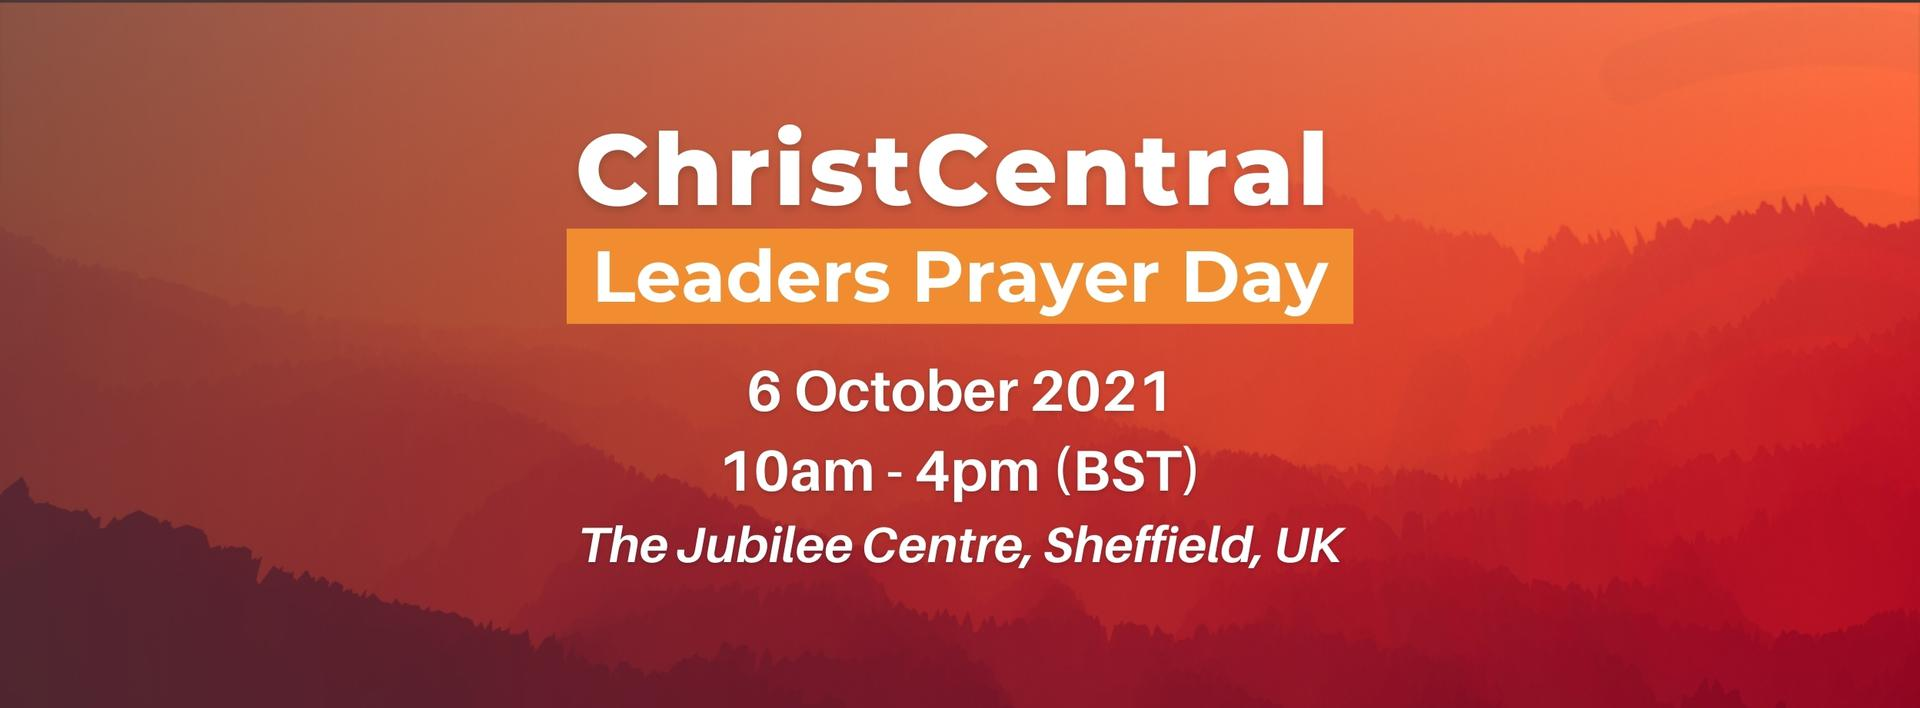 ChristCentral Leaders Prayer